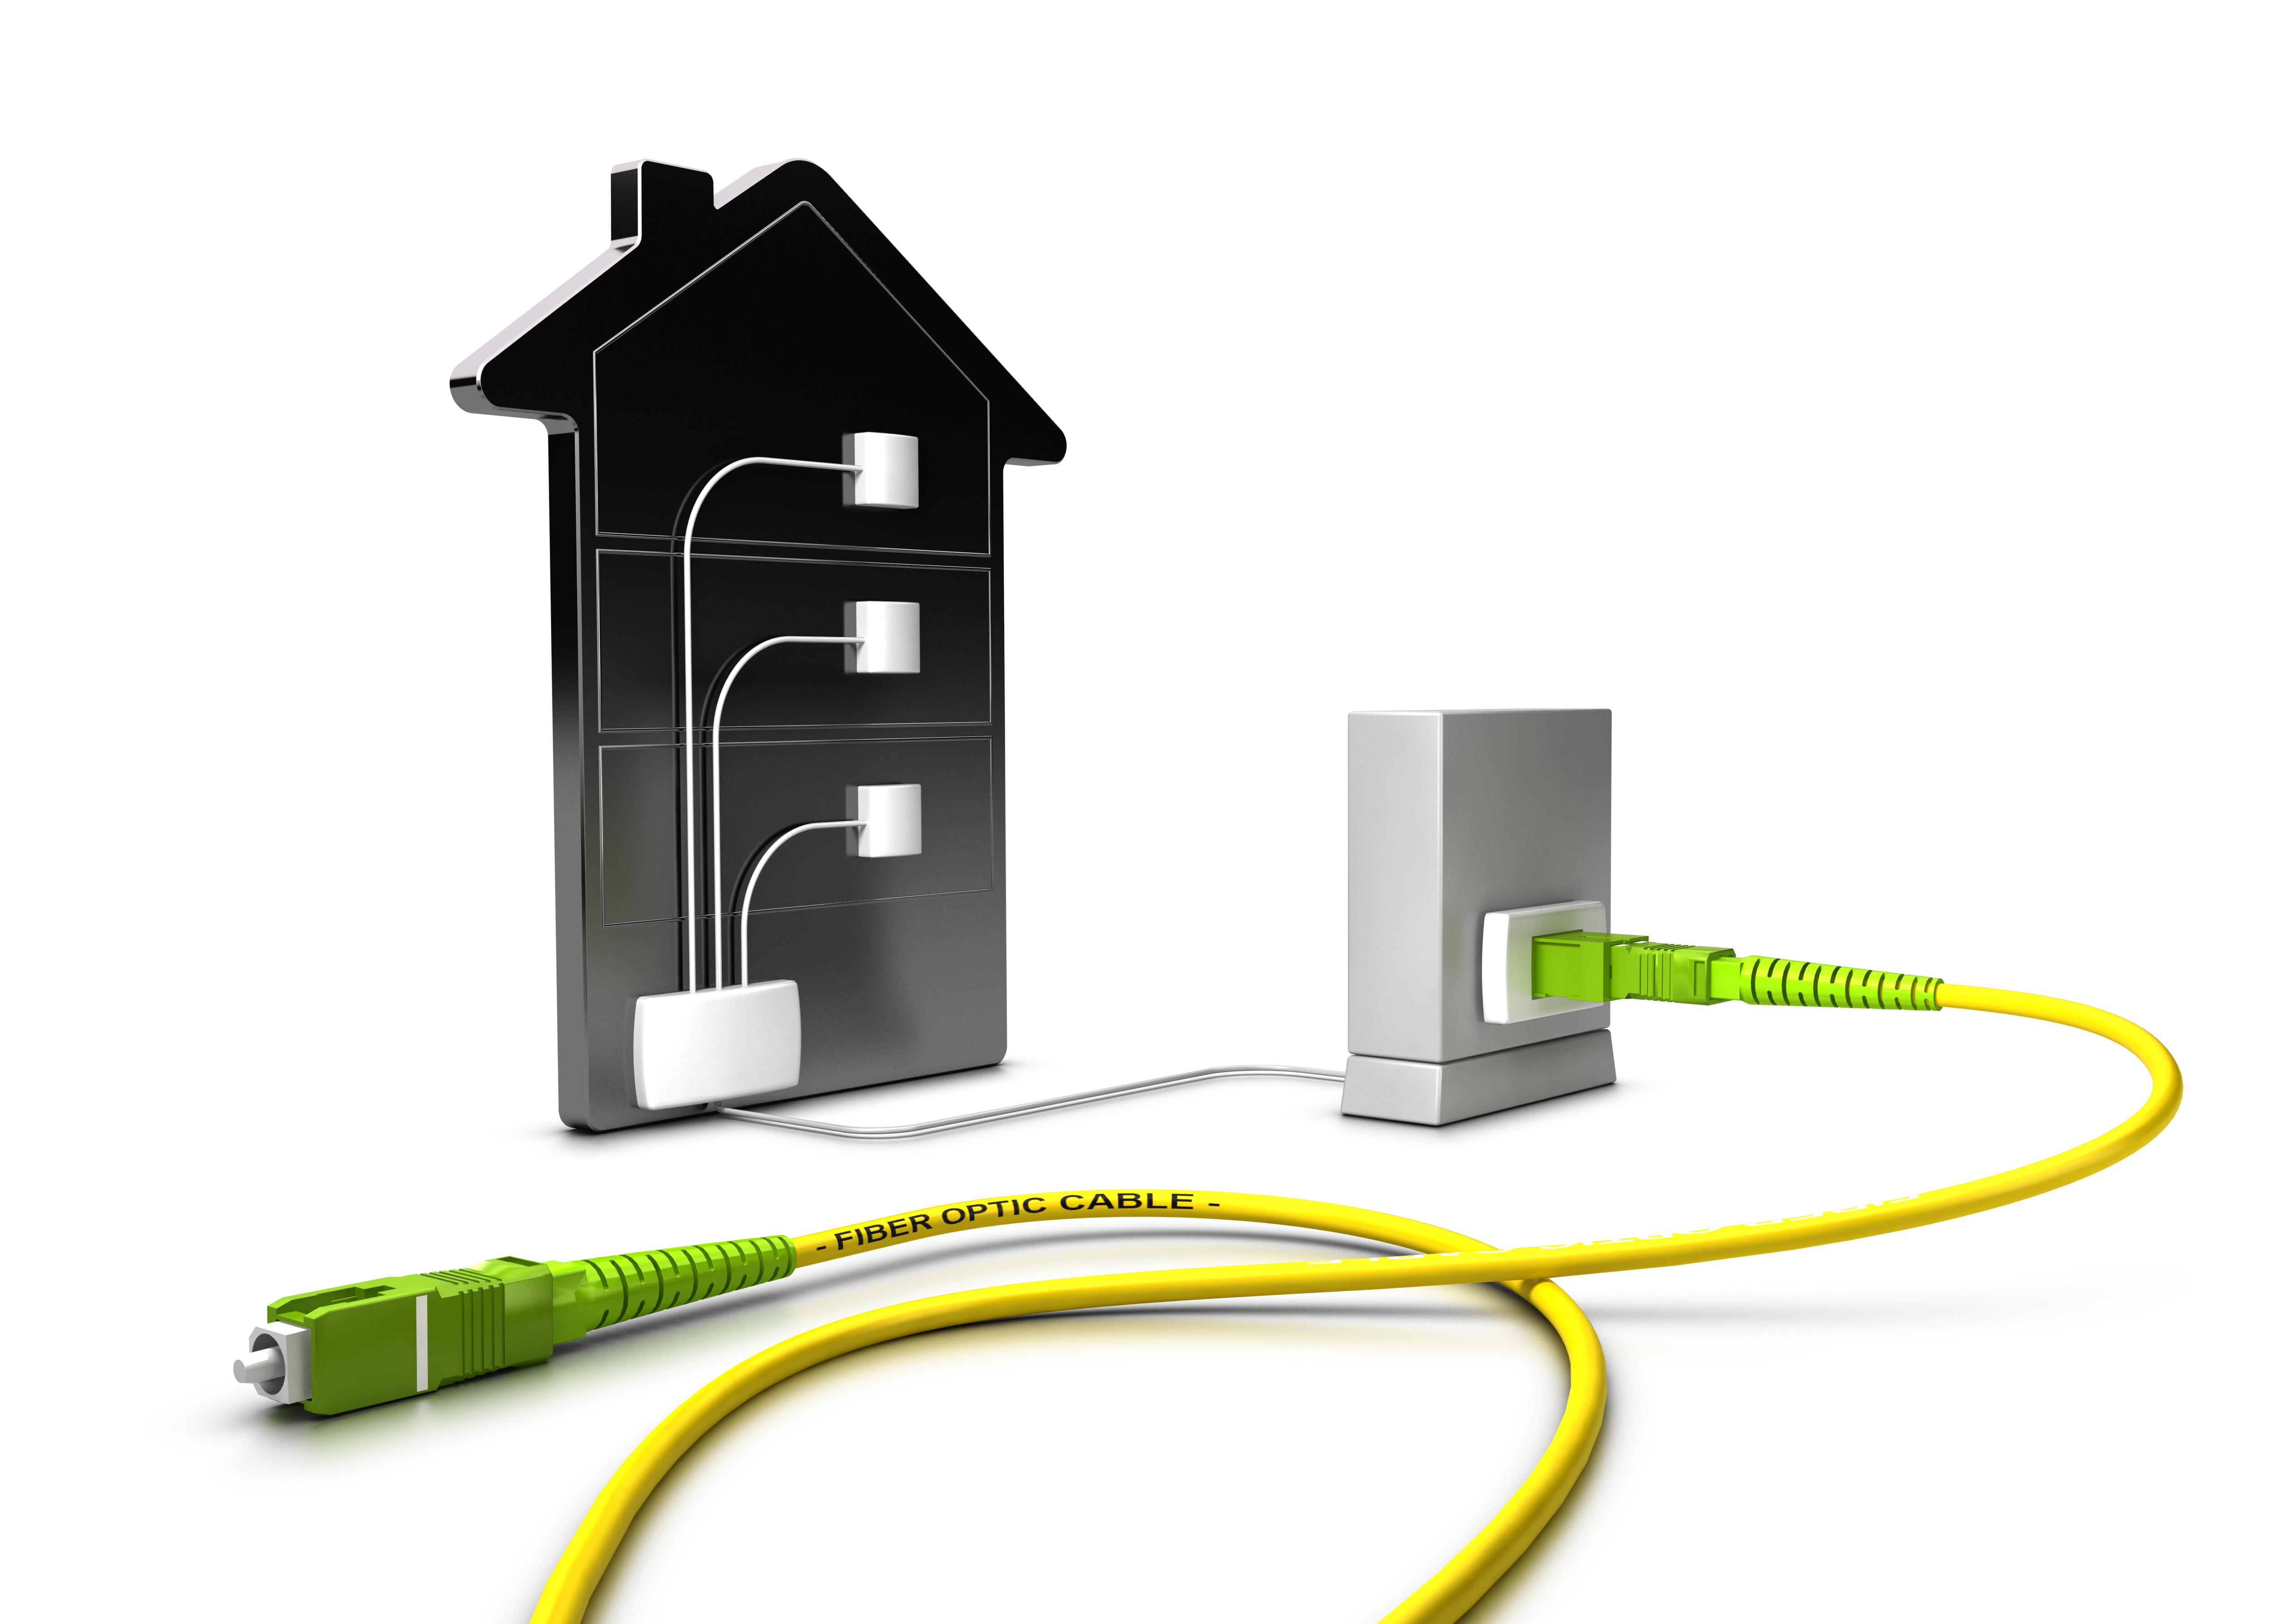 FTTC Broadband